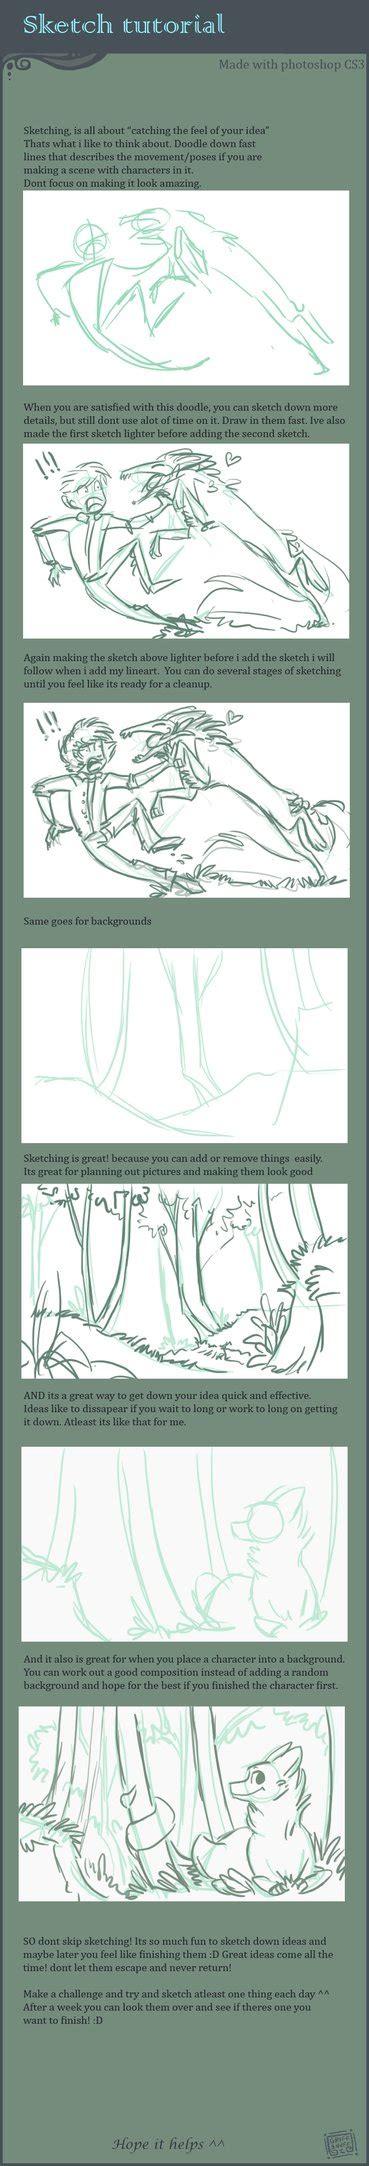 sketchbookx tutorial sketching tutorial by griffsnuff on deviantart